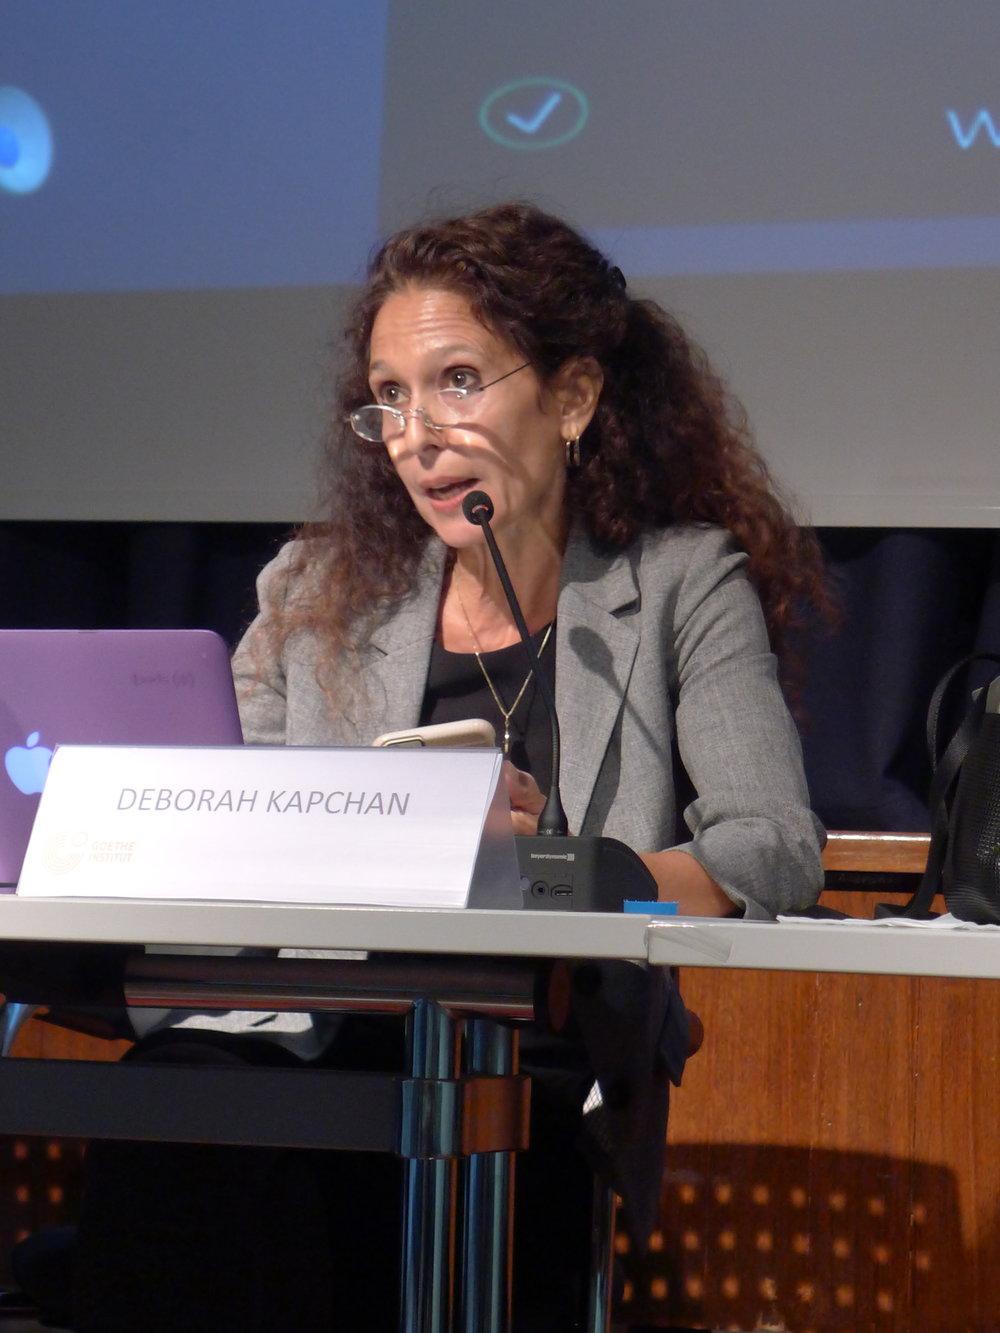 Deborah Kapchan - USA